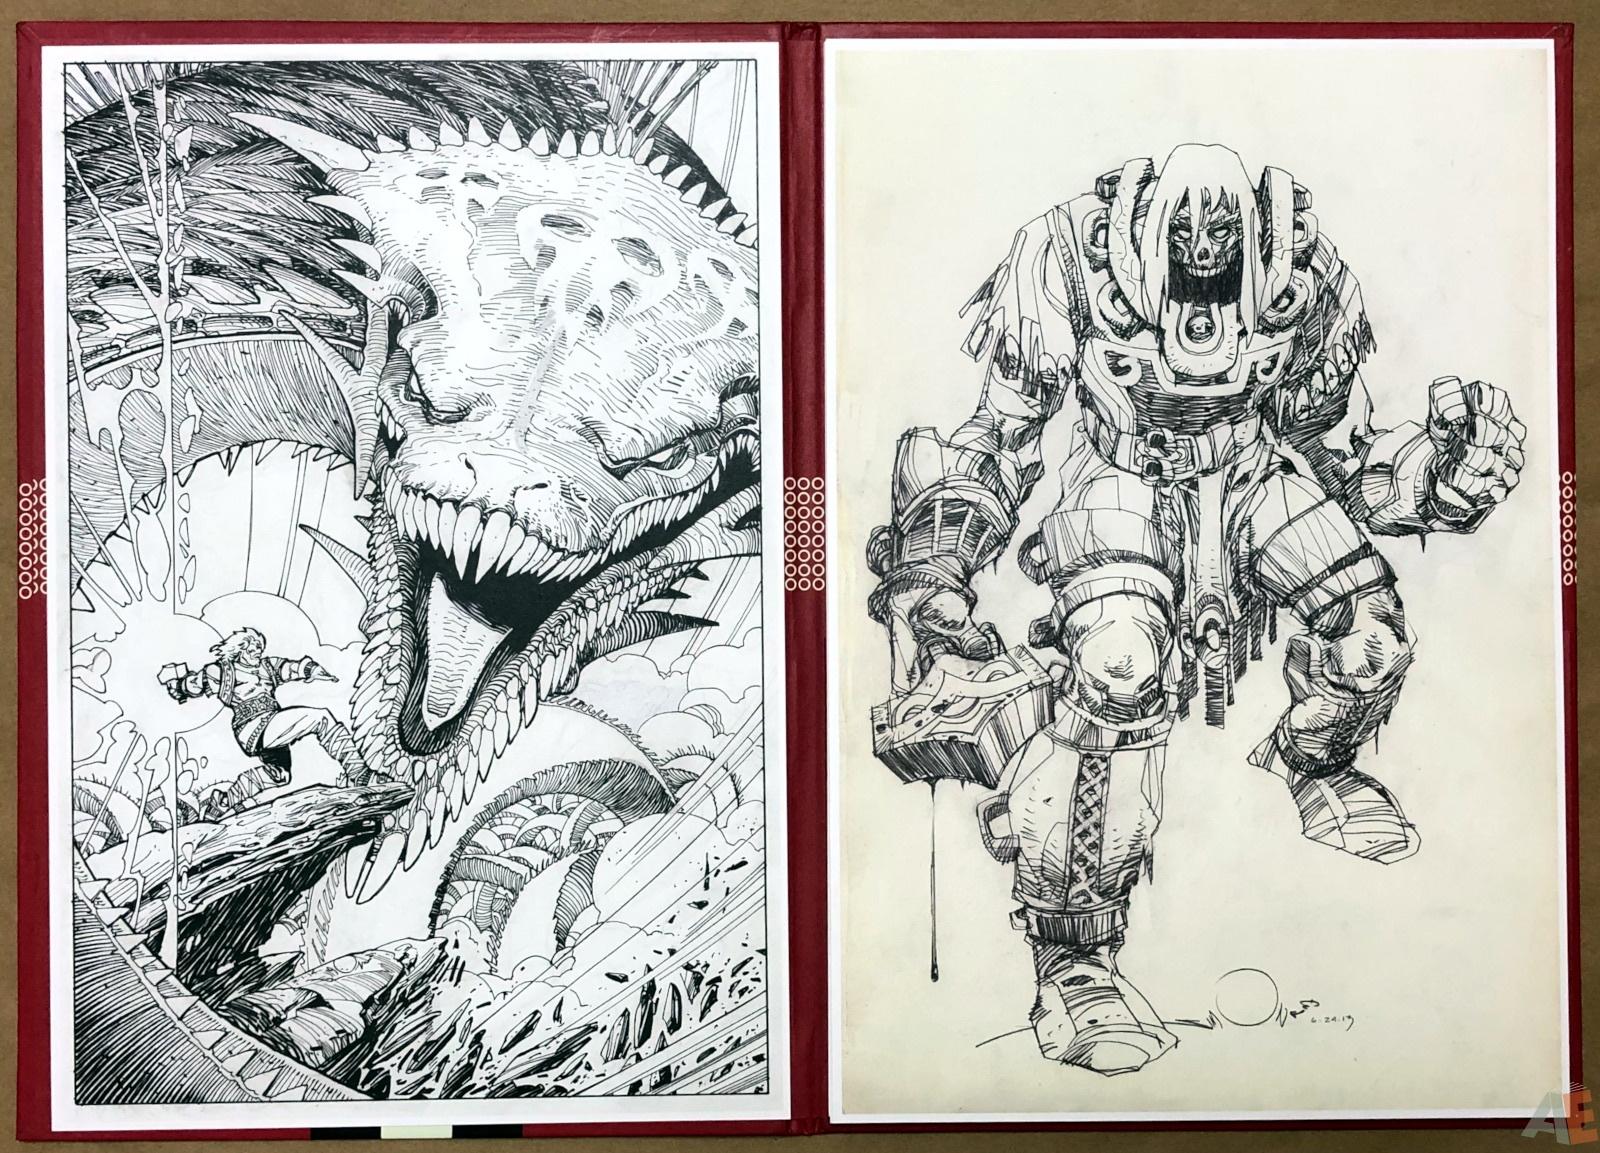 Walter Simonson's Ragnarök Artist's Edition Portfolio